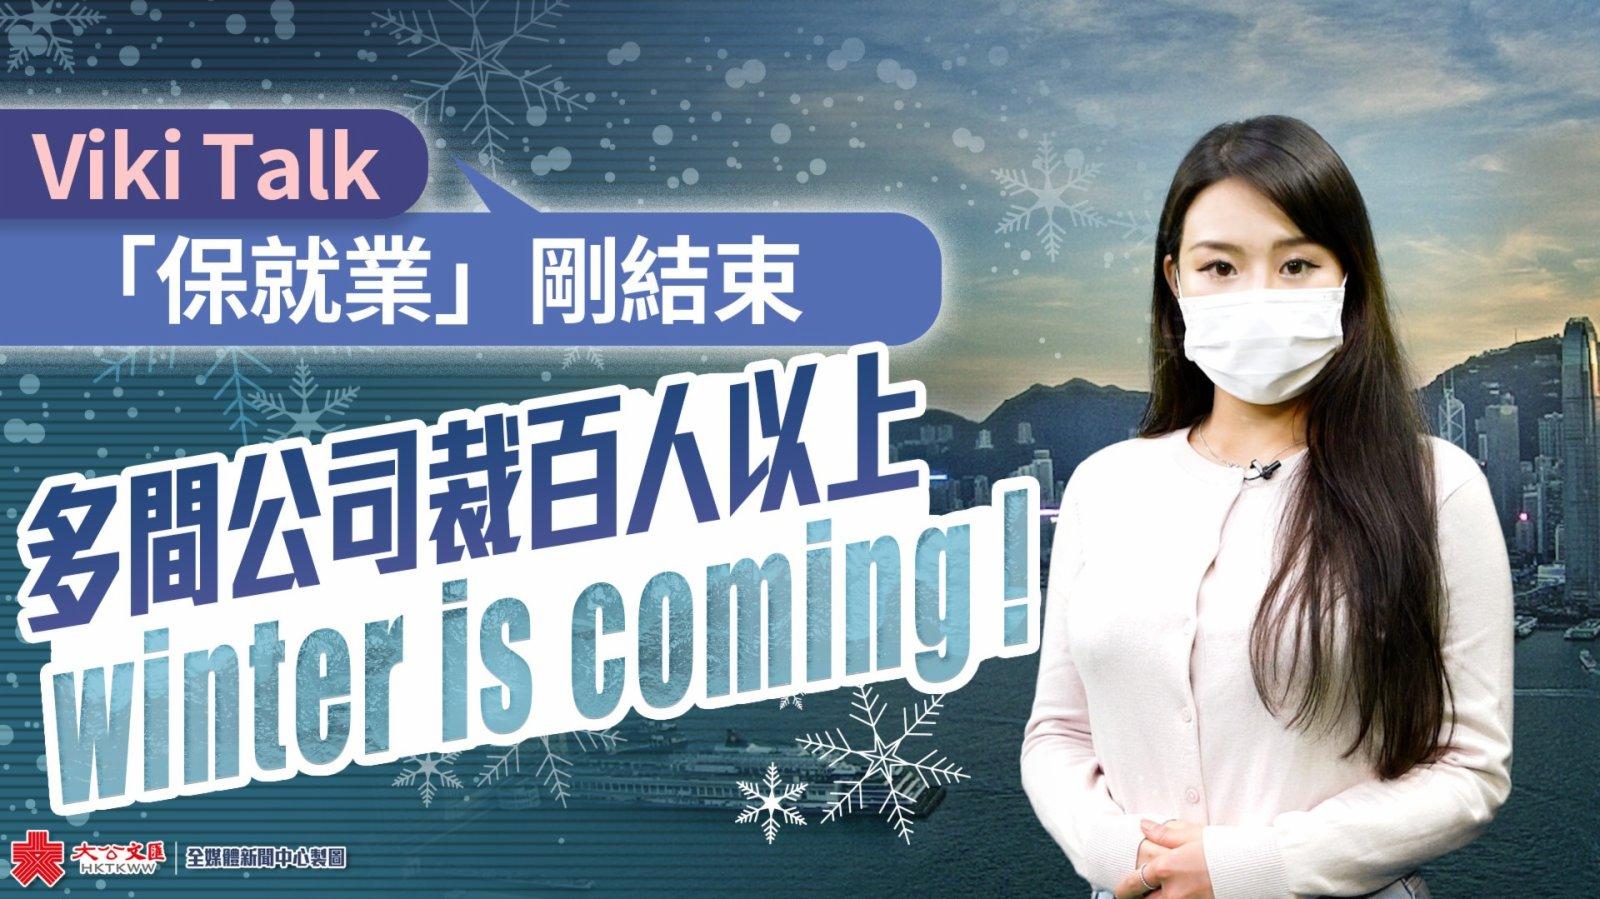 Viki Talk | 「保就業」剛結束 多間公司裁百人以上 Winter is coming!